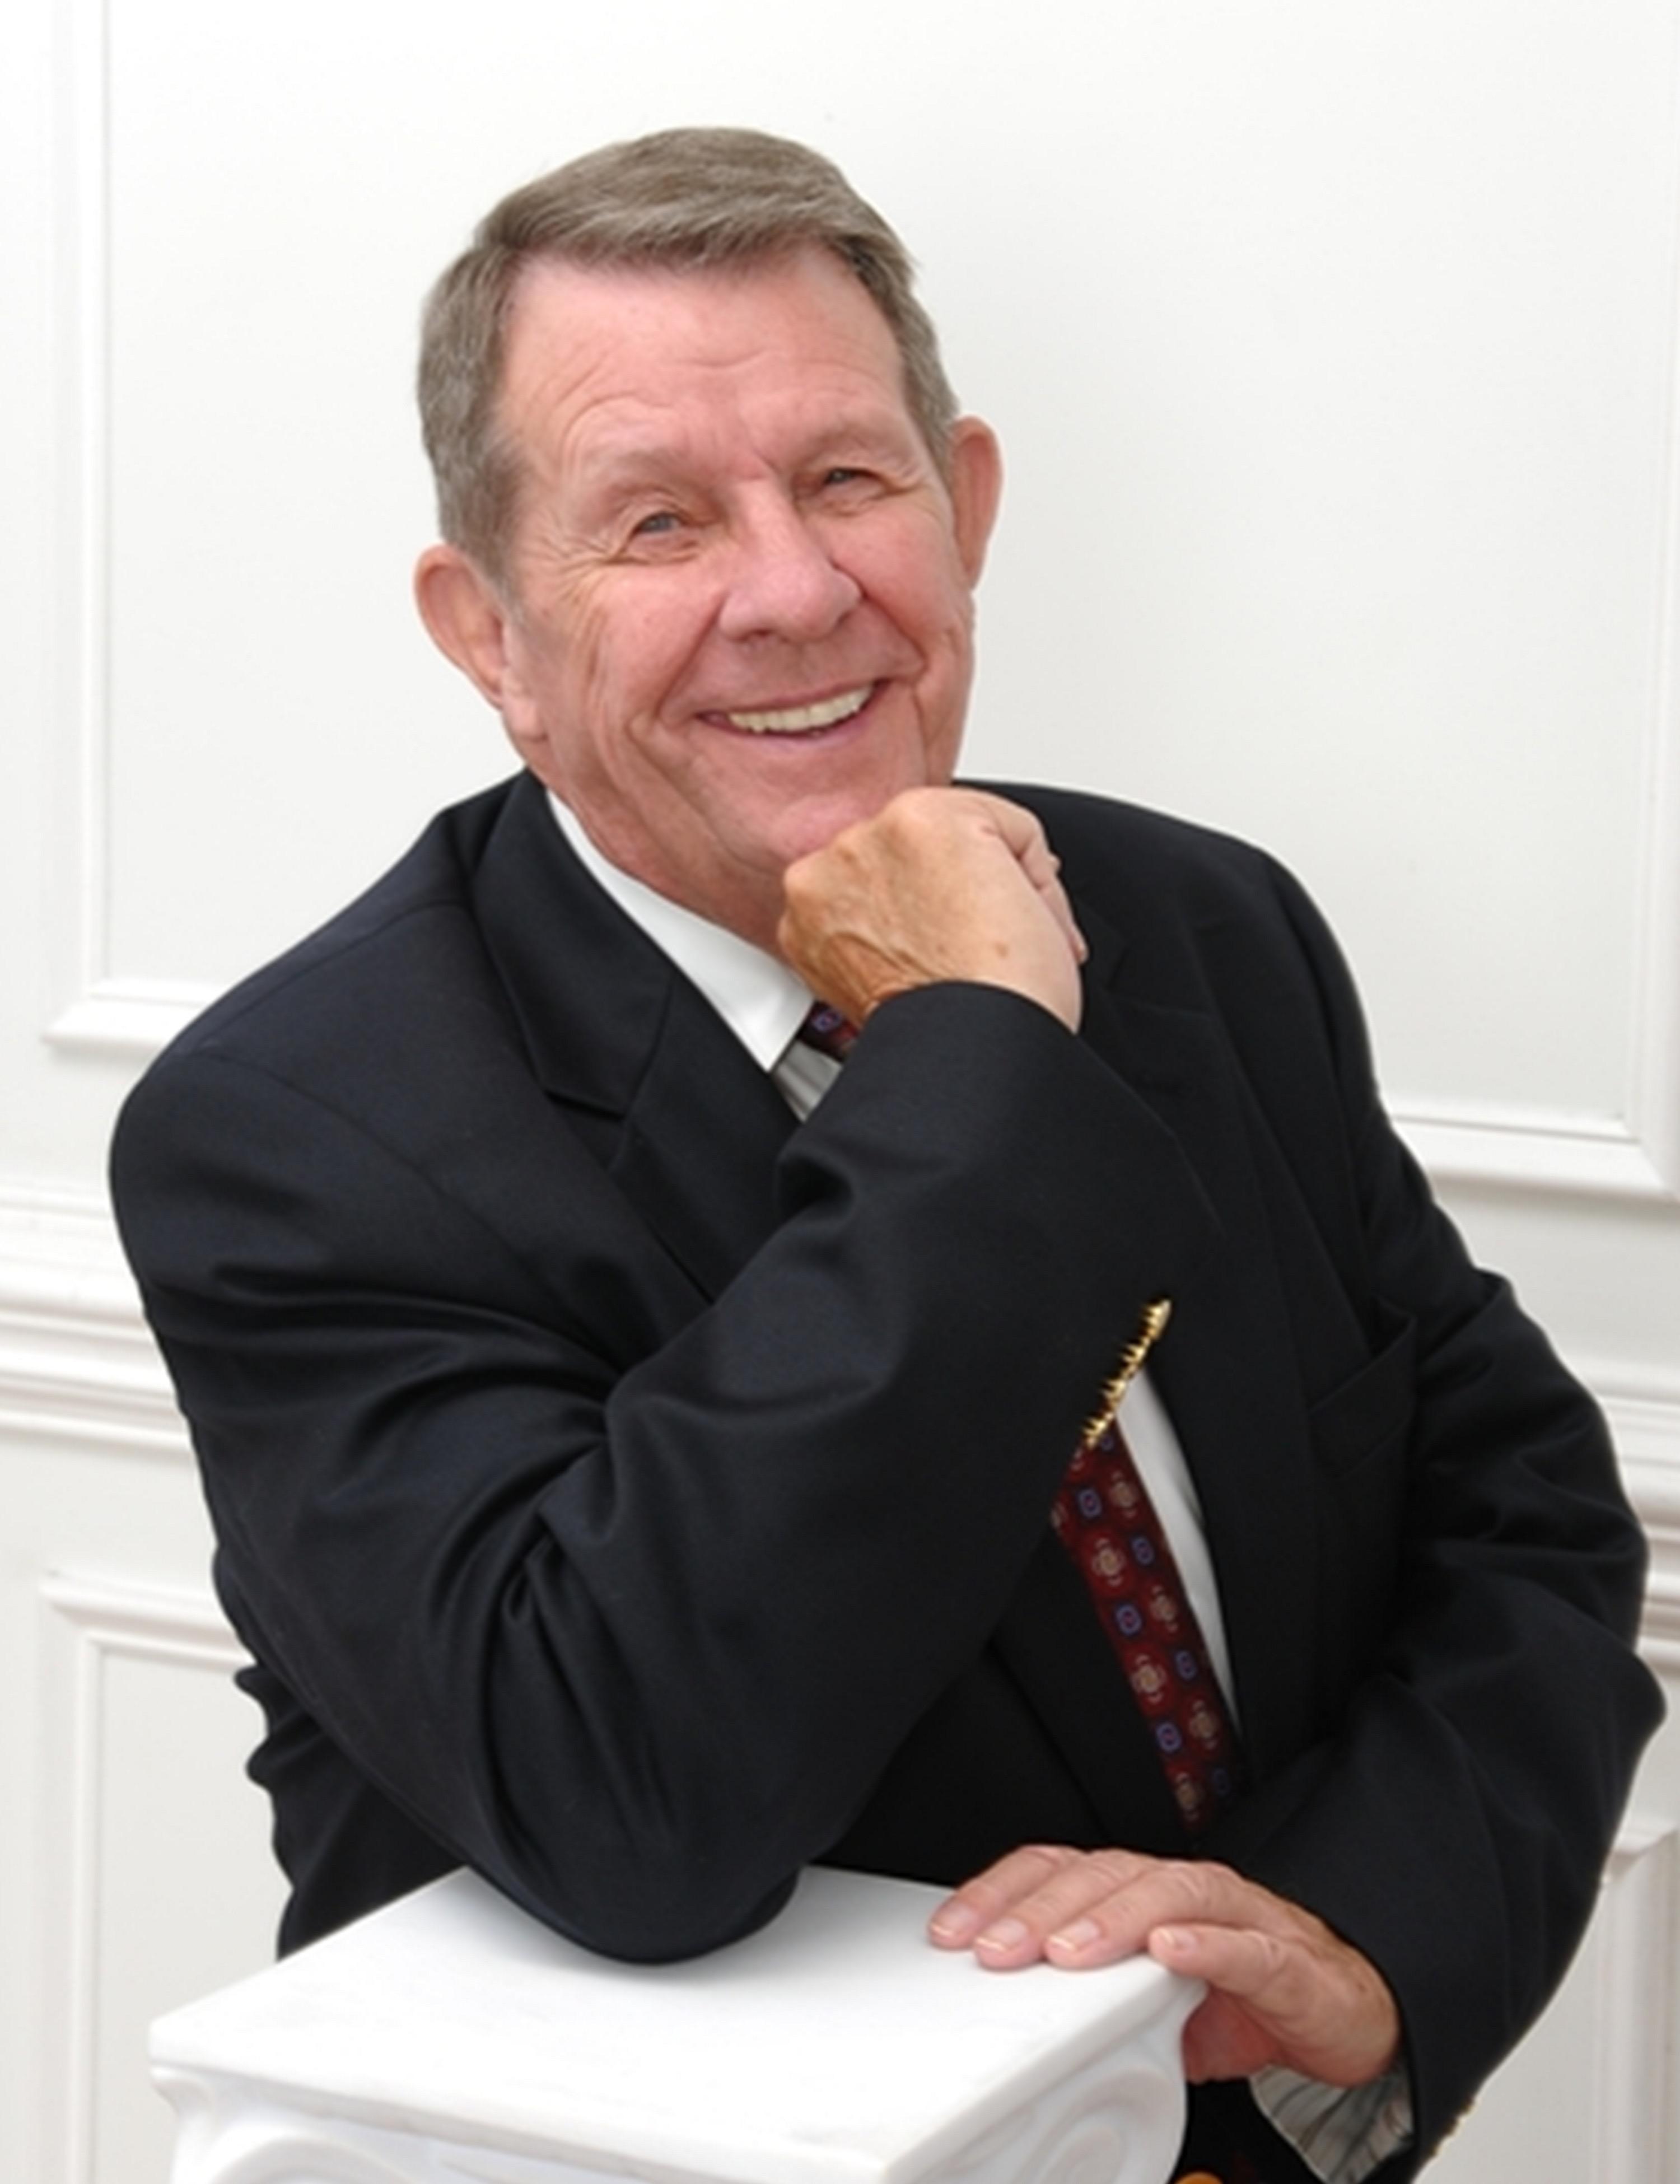 Larry Paylor